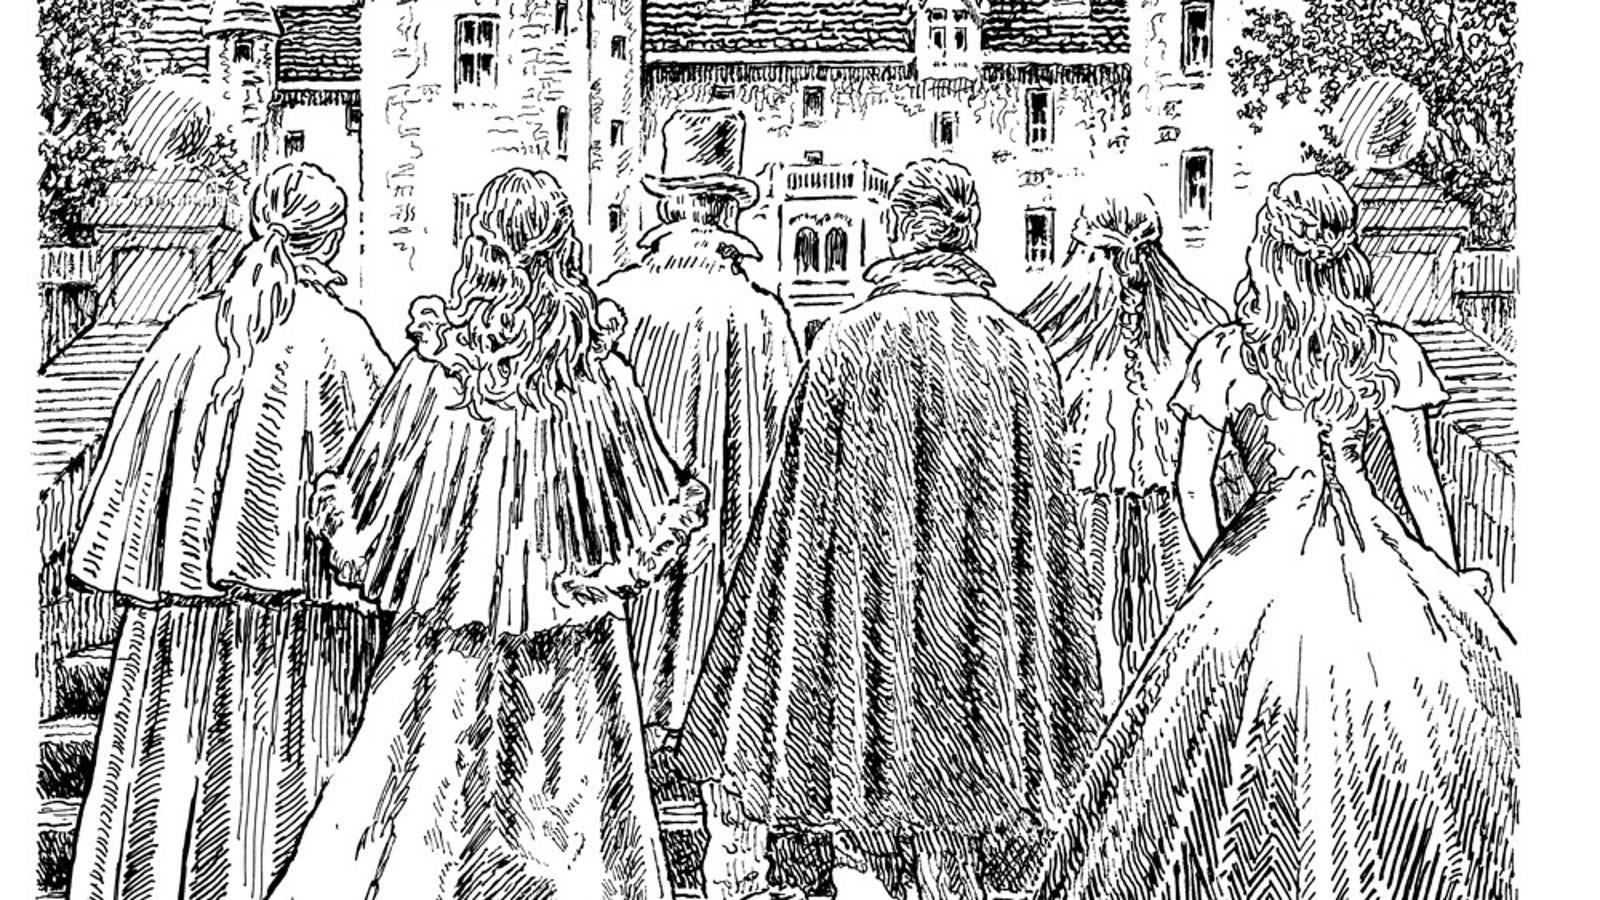 We've Got a Sneak Peek at Anne Rice's New Vampire Lestat Tale, Blood Communion